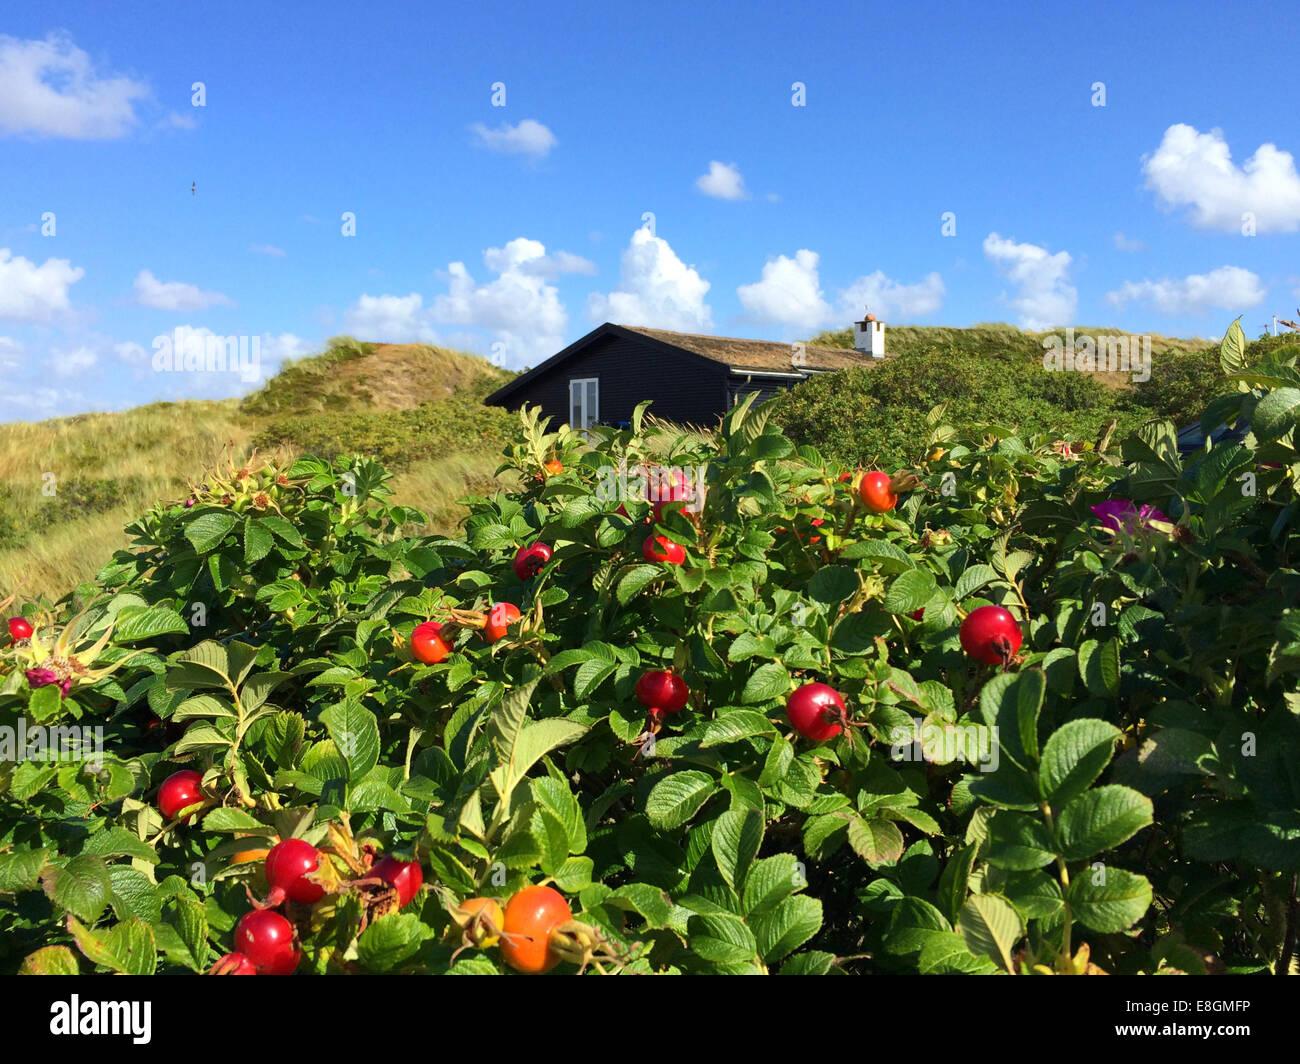 Summerhouse with rosehip bushes in foreground, Fanoe Bad, Fanoe, Denmark - Stock Image